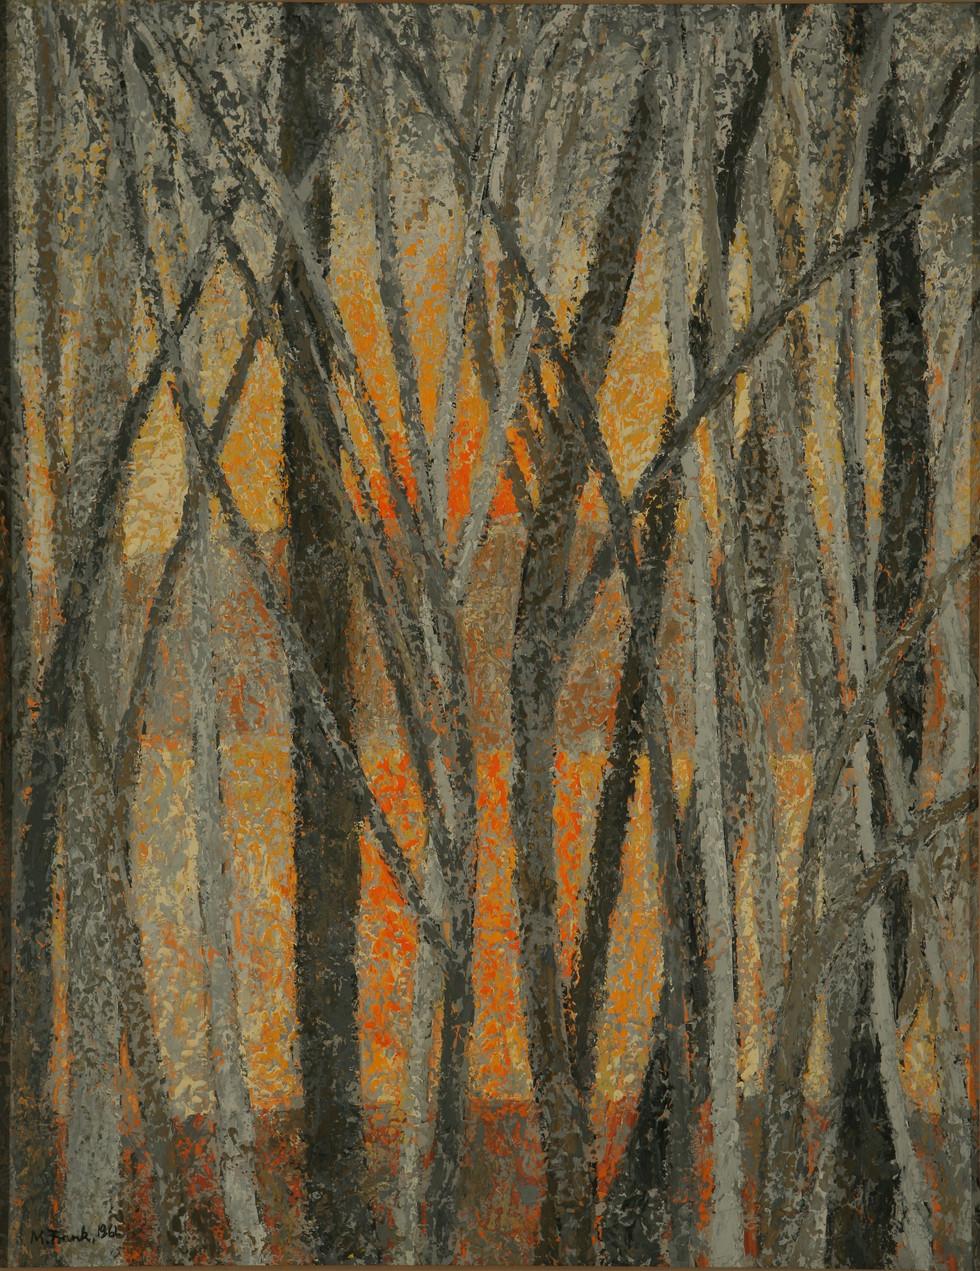 Orange Sunset (Winter Sky with Leafless Trees)